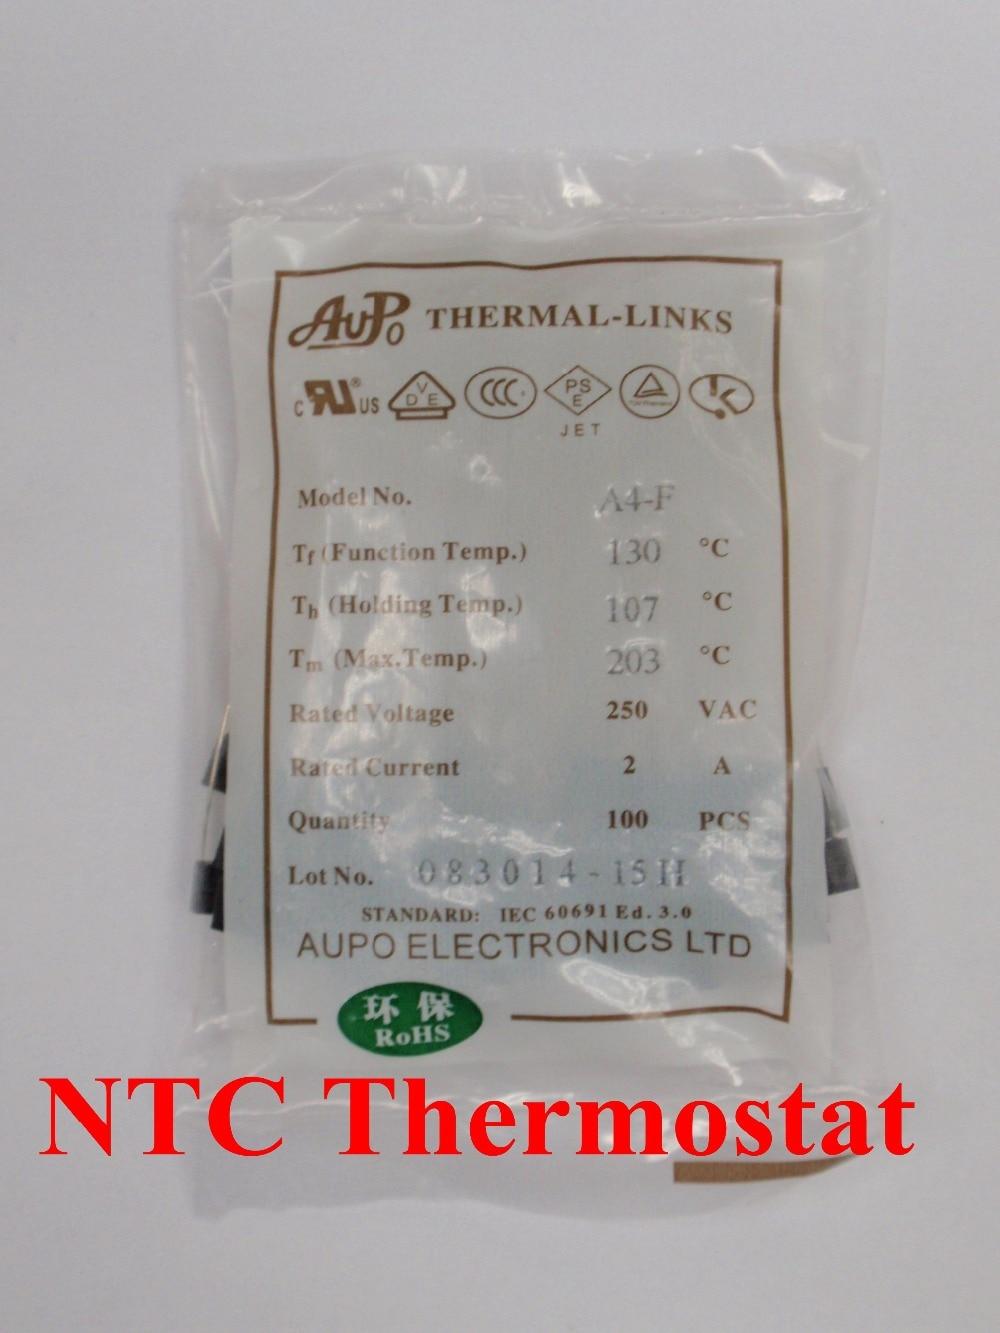 100pcs A1-F 102C 3A 250V degree Thermal Cutoff RH102 Thermal-Links Black Square temperature fuse